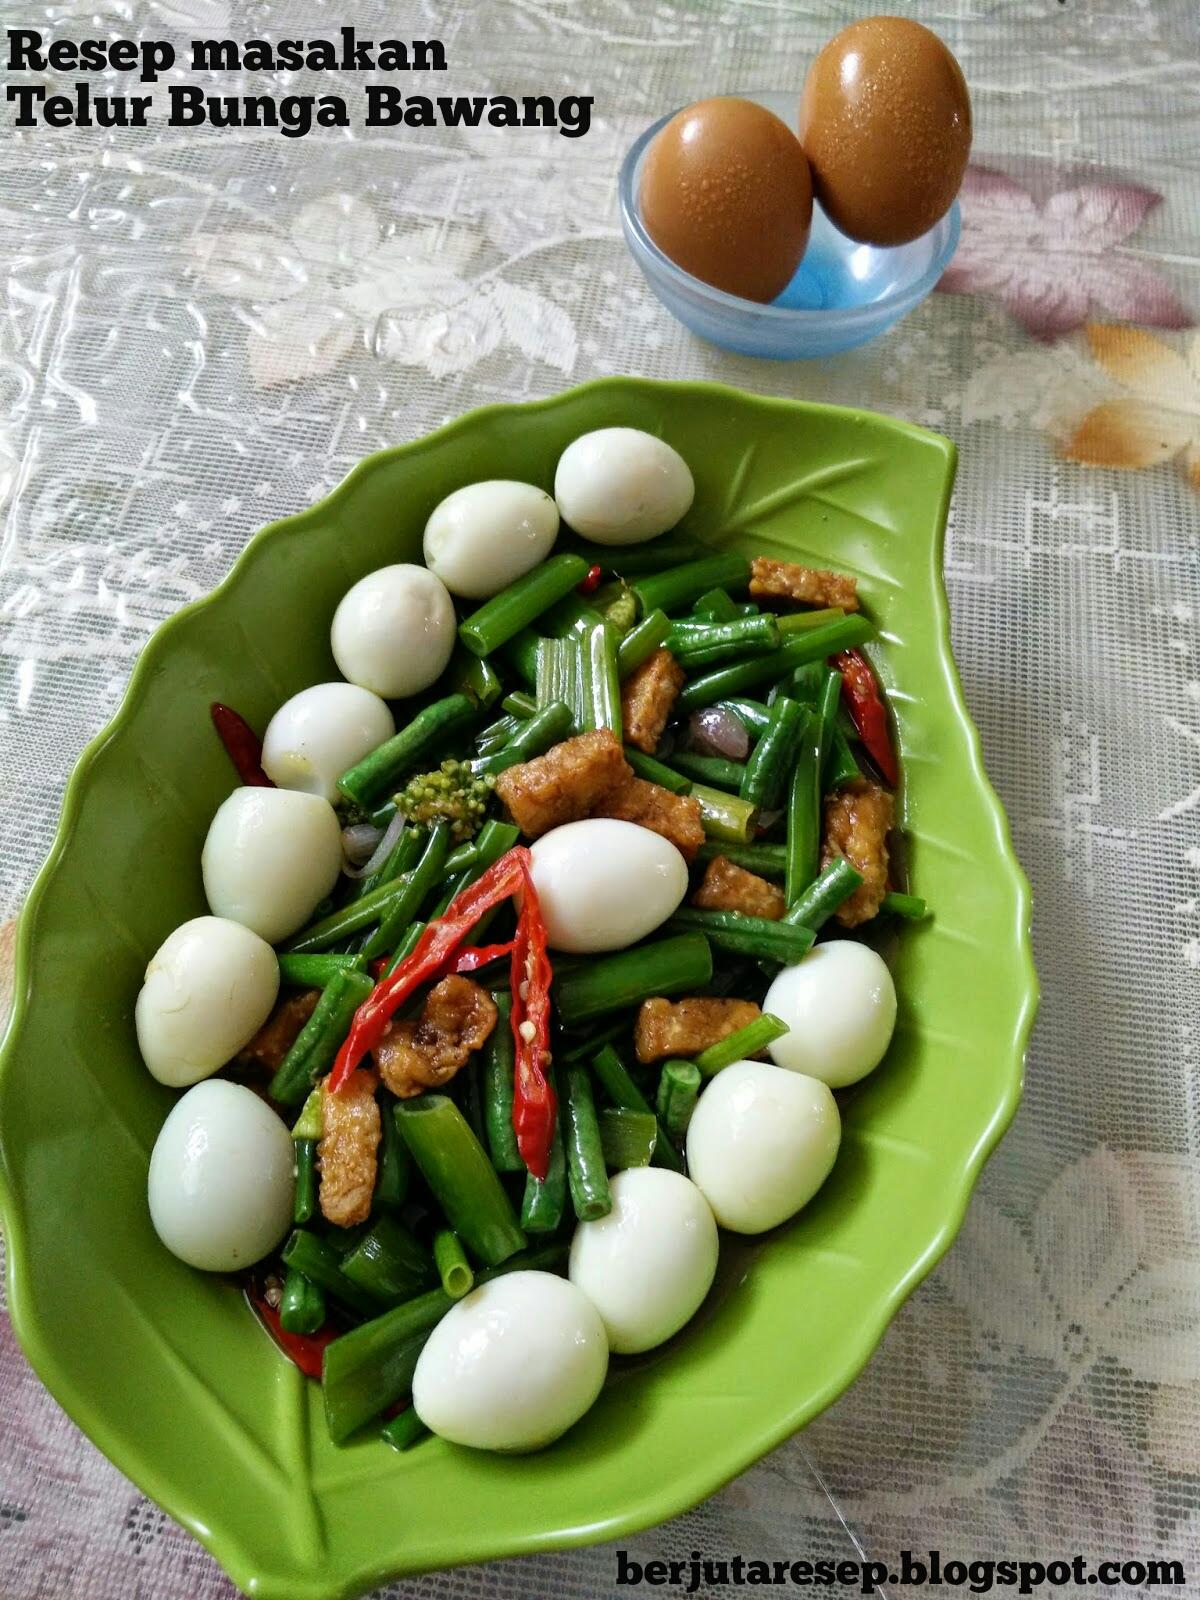 resep masakan telur bunga bawang jutaan resep makanan